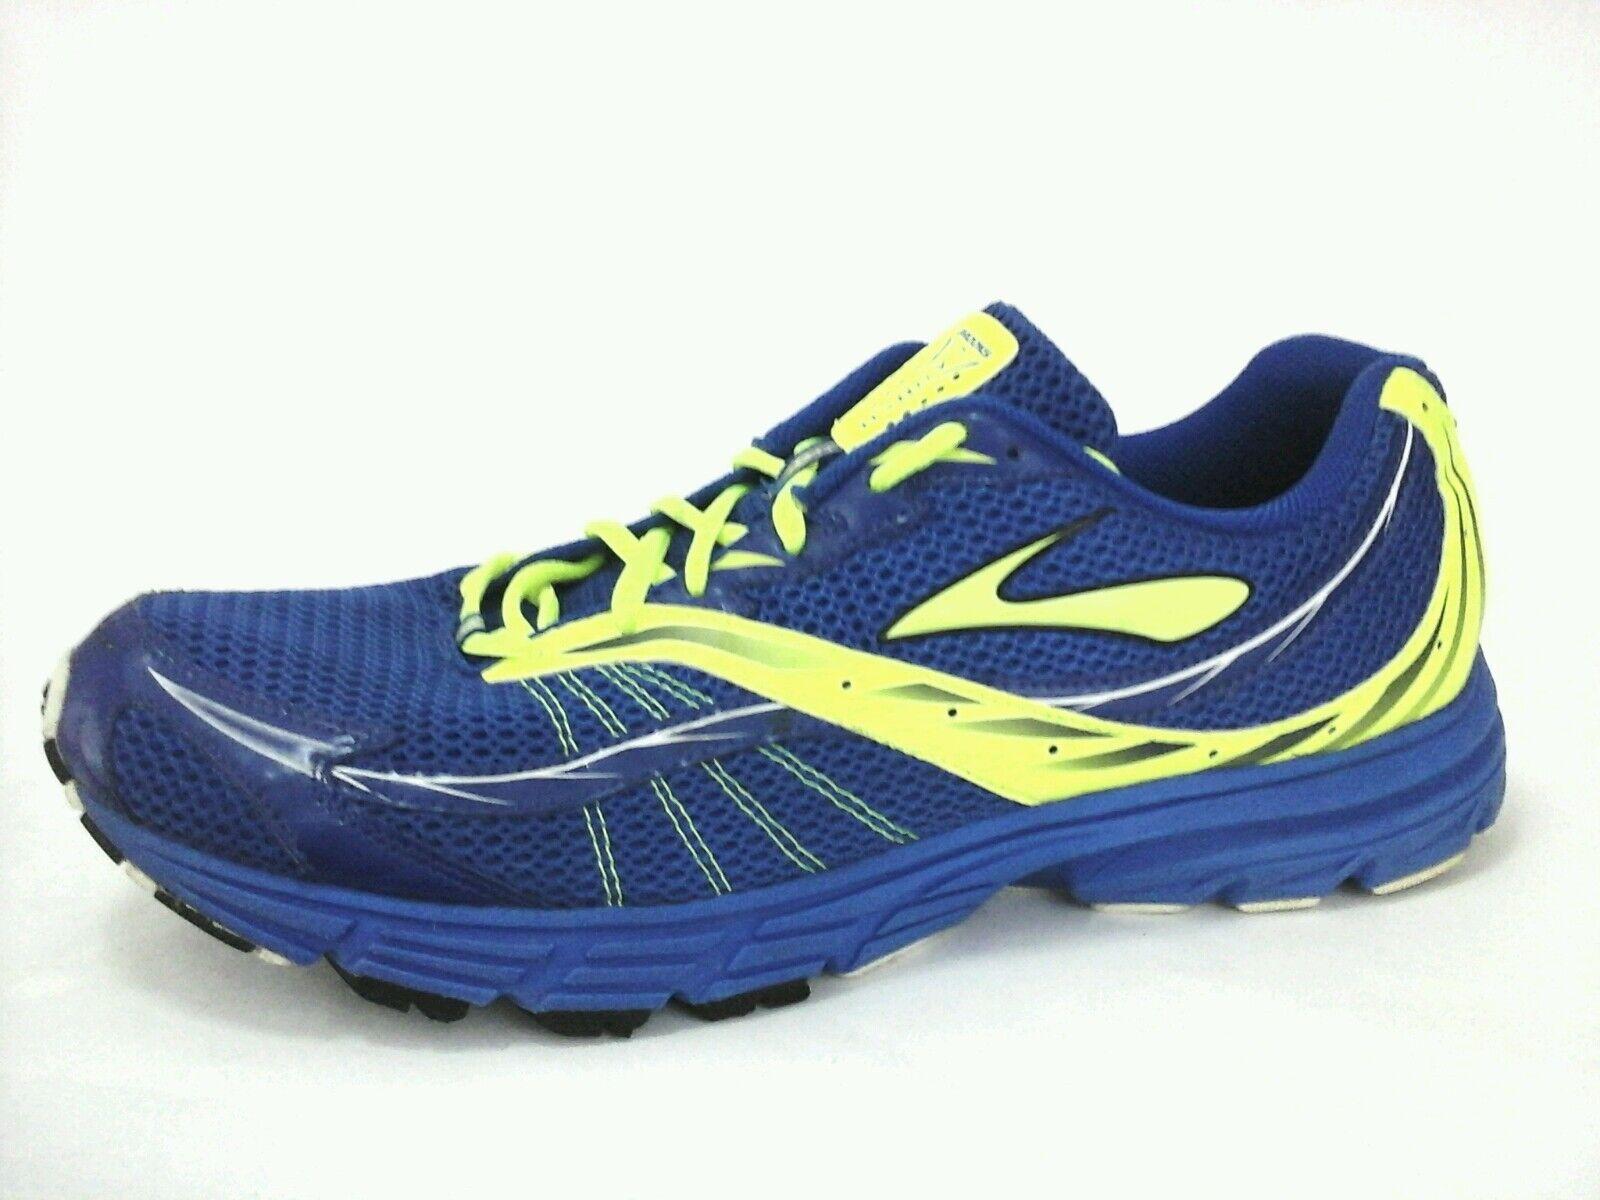 new concept 369ff 724ca BROOKS Sneakers Launch Men Blue Yellow Running Running Running Shoes Men s US  14  100 6d2784